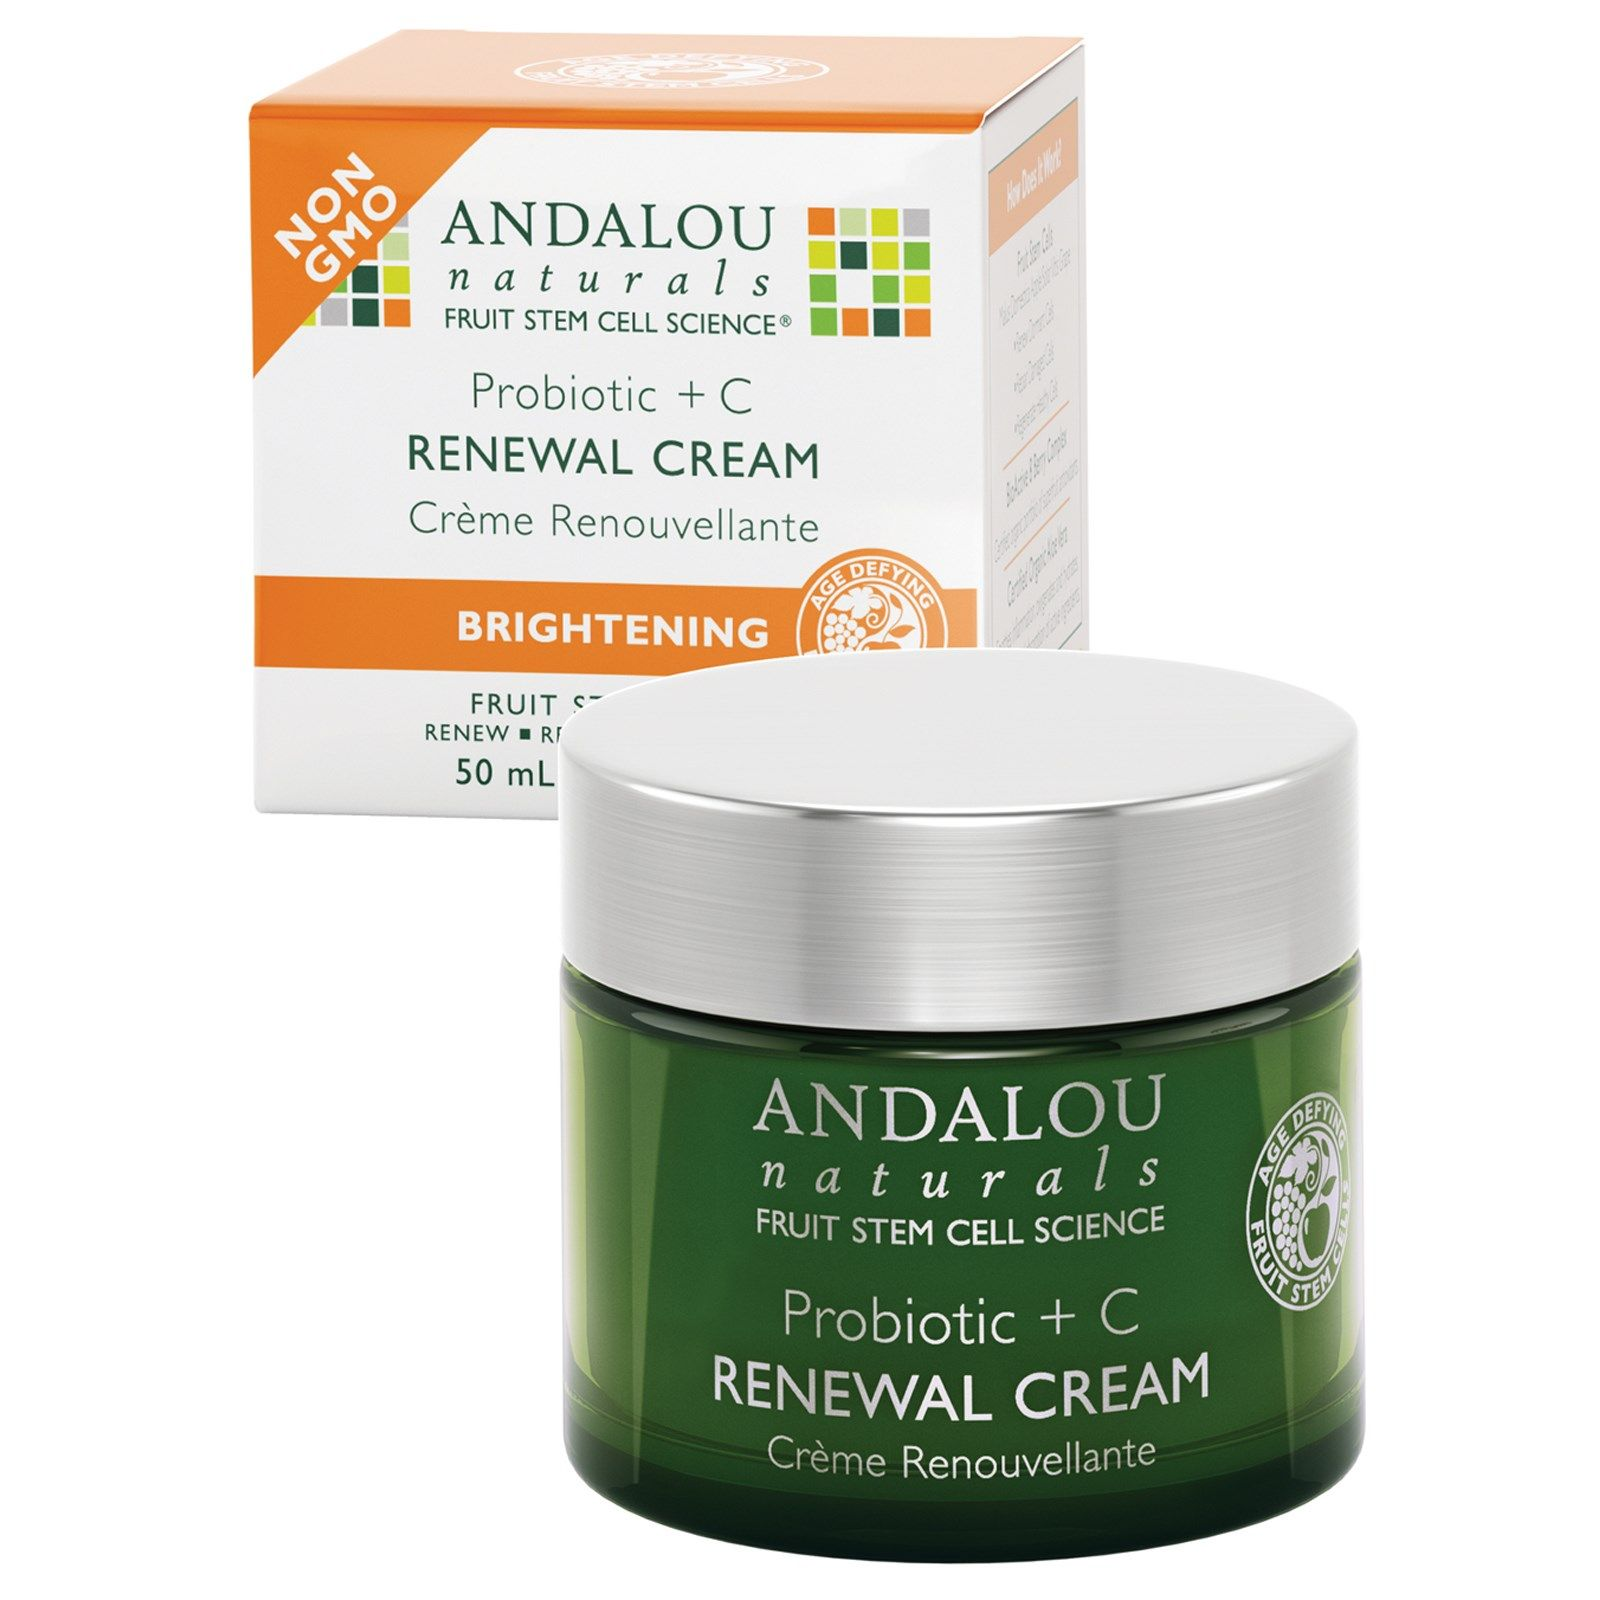 Brightening Probiotic + C Renewal Cream - 1.7 oz. by Andalou Naturals (pack of 2) Moisture Skin Cleansing Cream 6.76oz